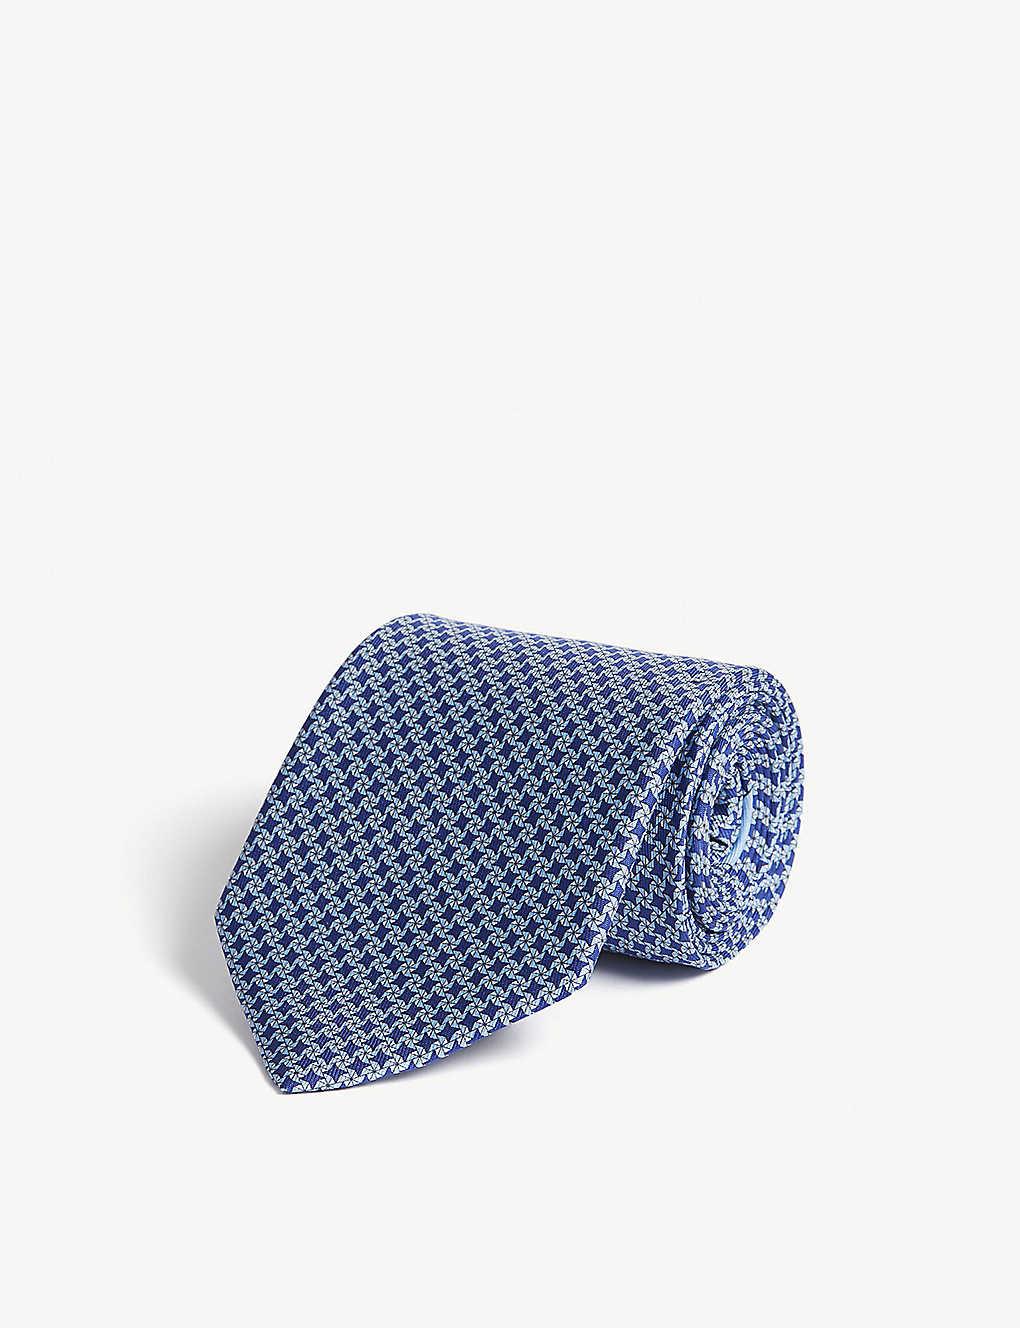 93e3d6298b72 SALVATORE FERRAGAMO - Star print silk tie | Selfridges.com